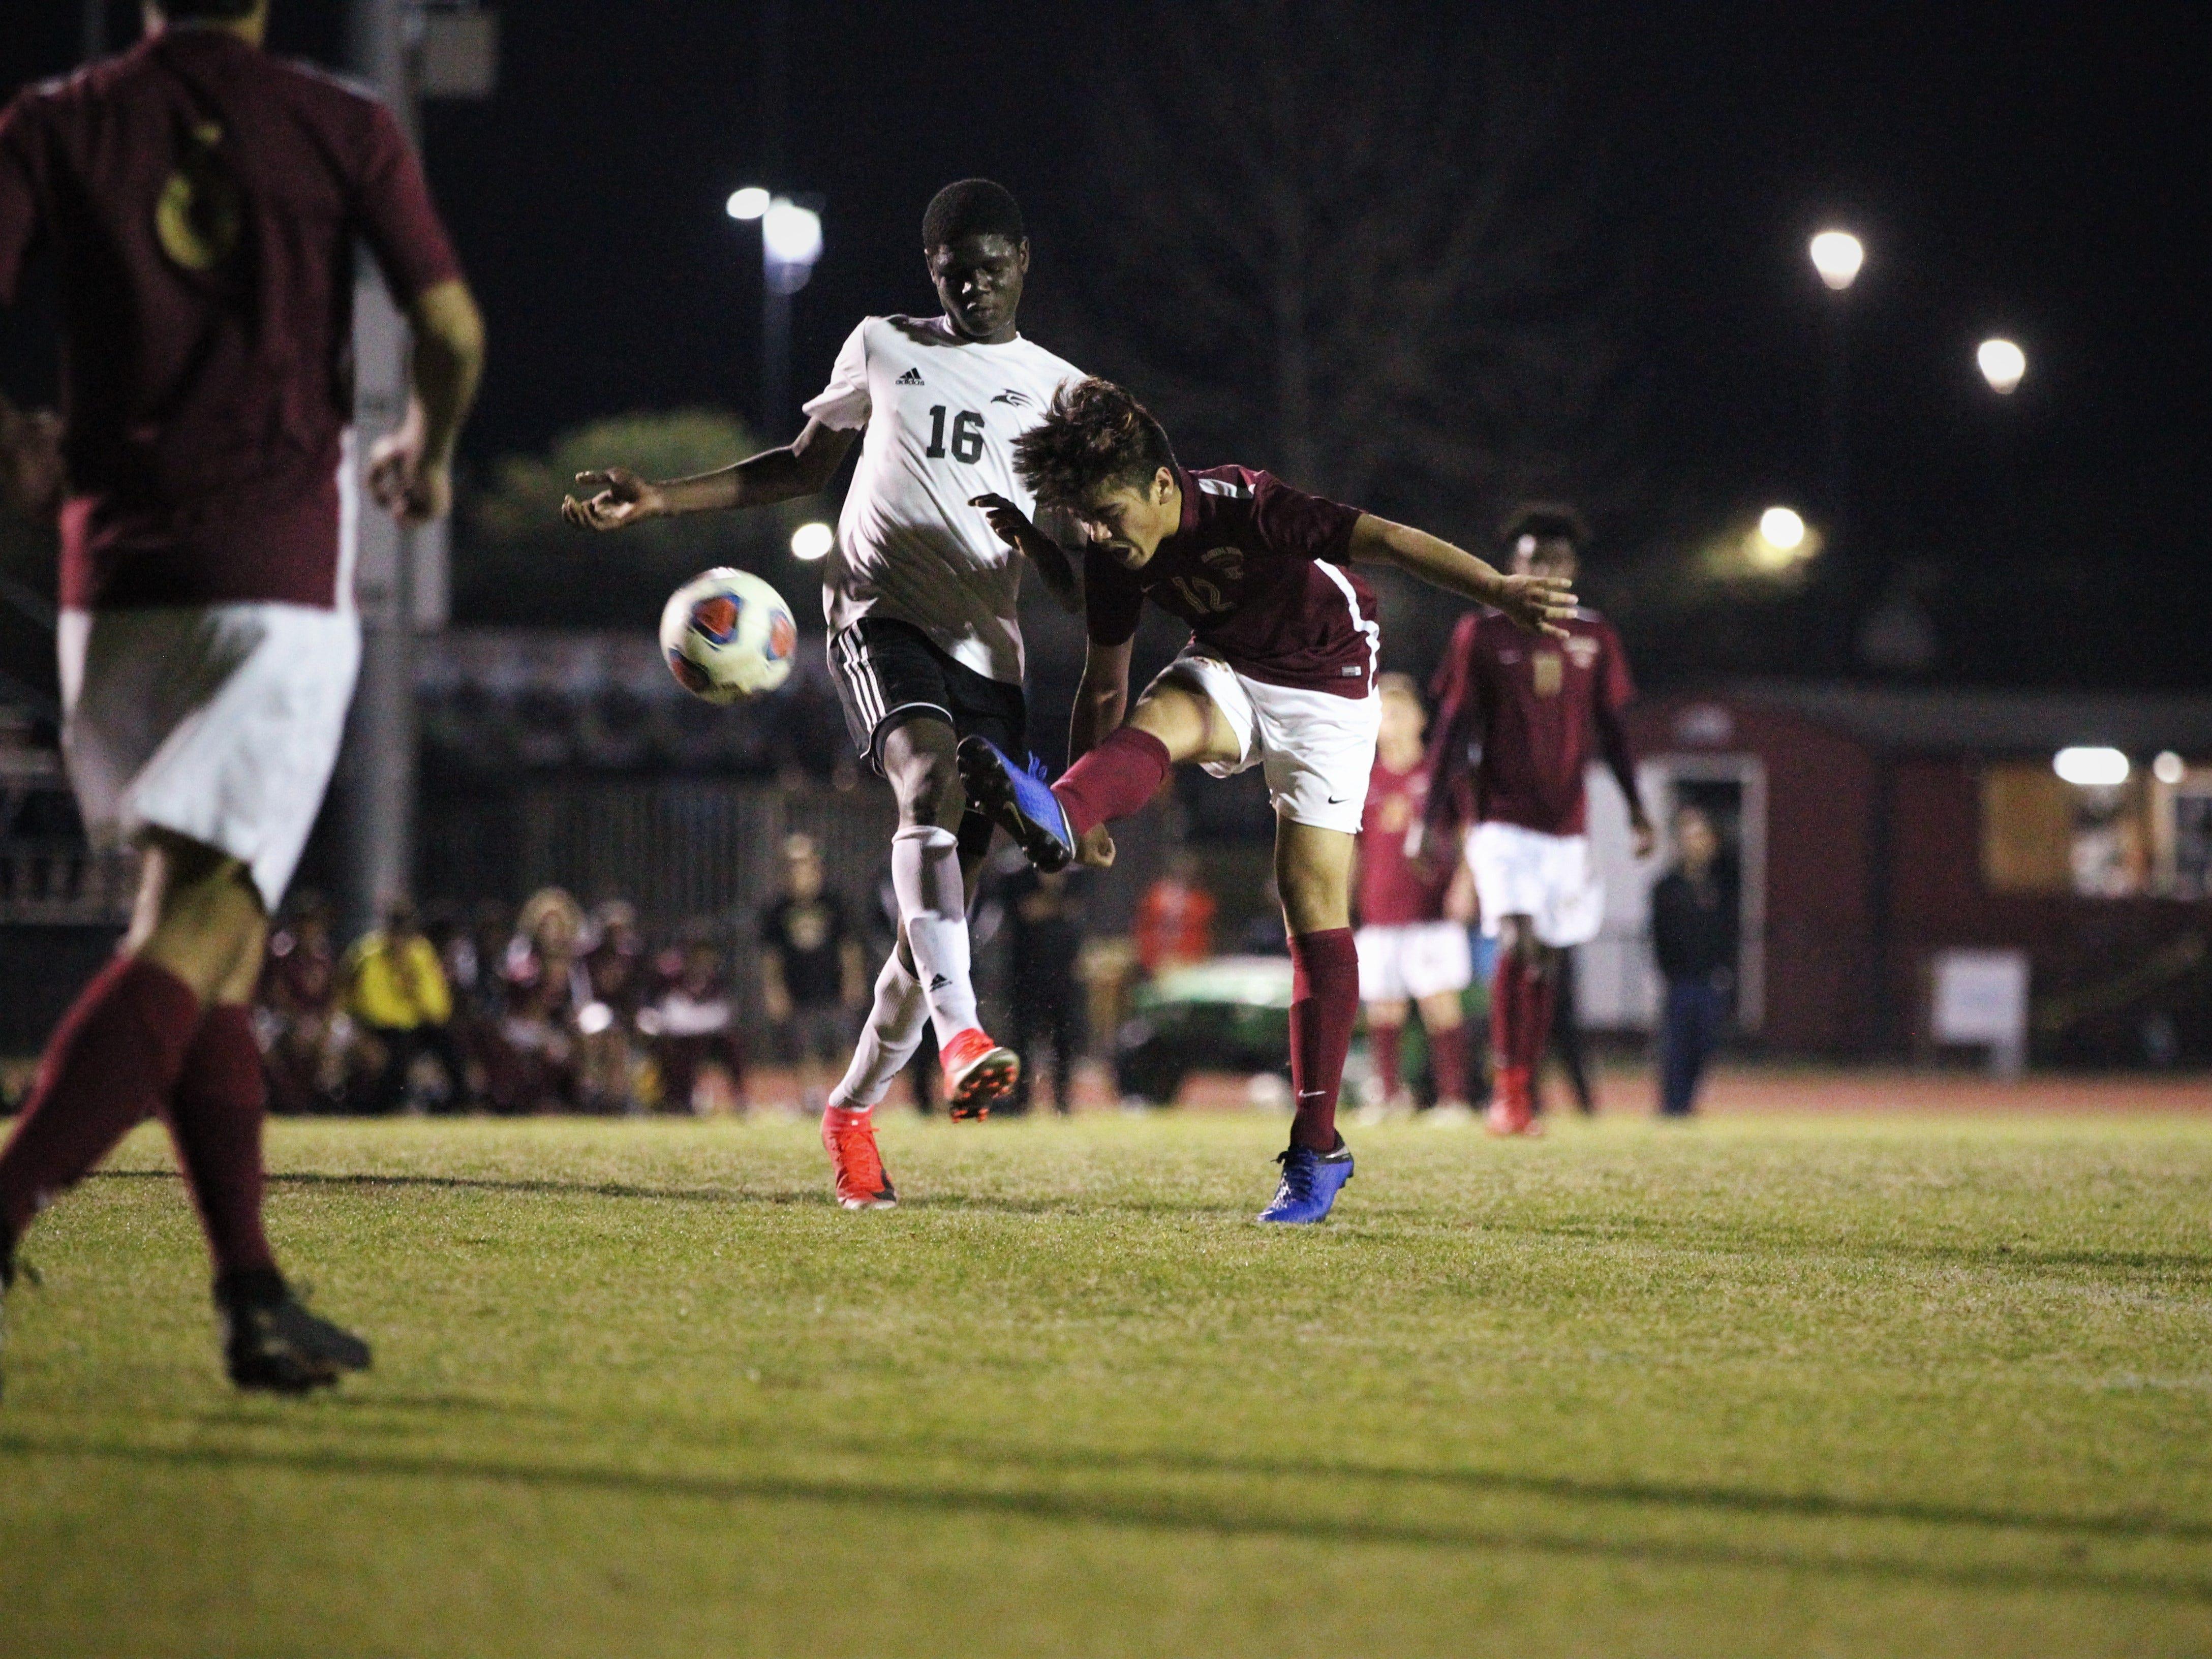 Florida High's Josh Limburg takes a shot as Florida High's boys soccer team beat South Walton 2-0 during a Region 1-2A quarterfinal on Feb. 6, 2018.